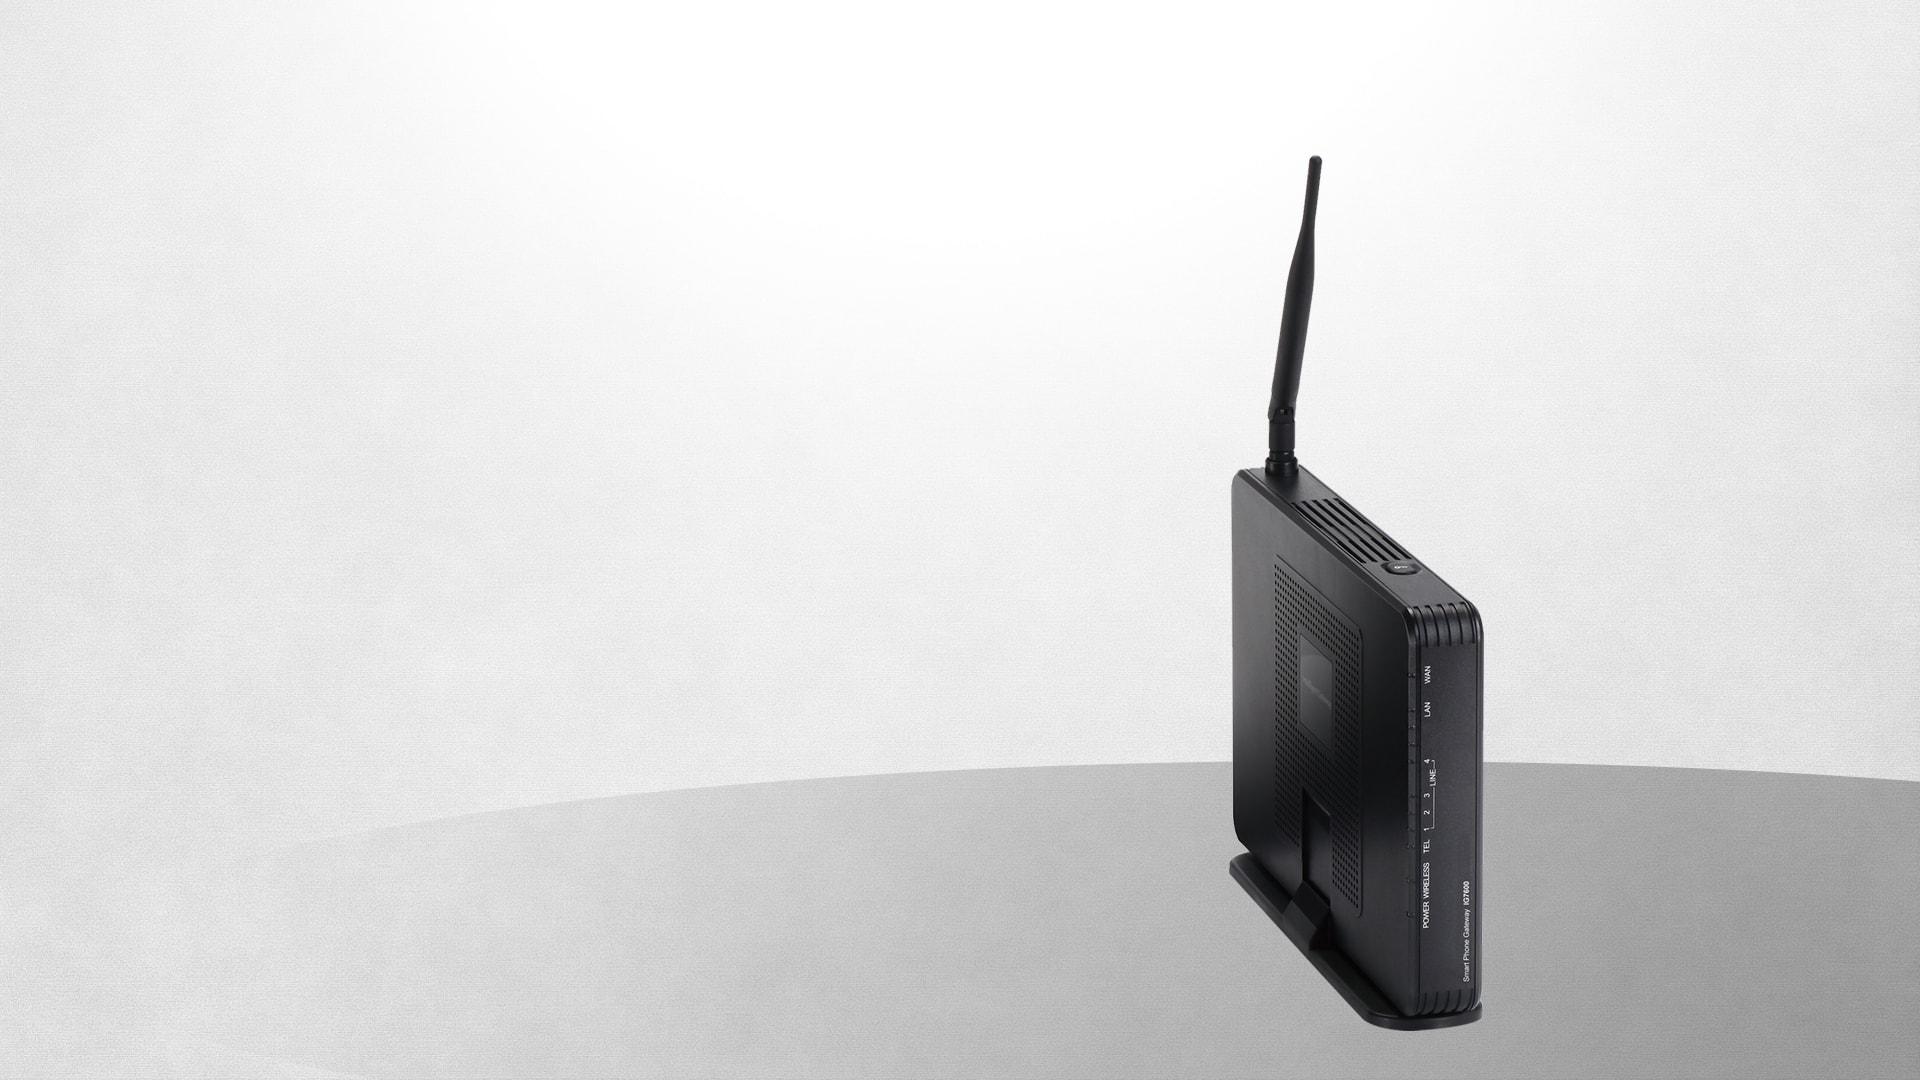 IG6600